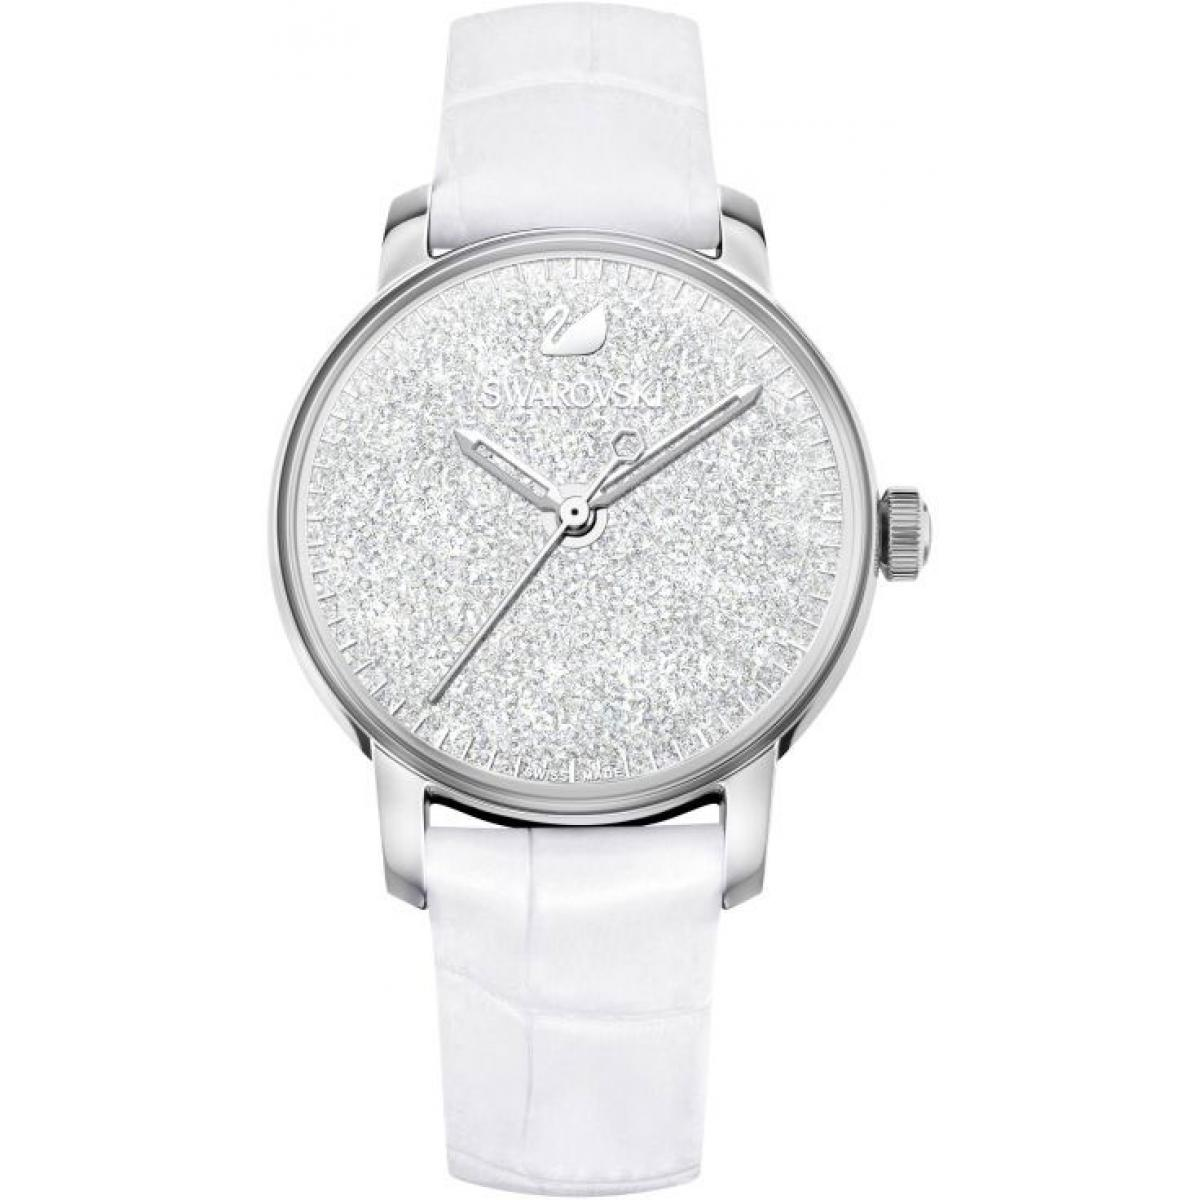 Montre Swarovski 5295383 - Montre Cristaux Swarovski Cuir - Swarovski montres - Modalova